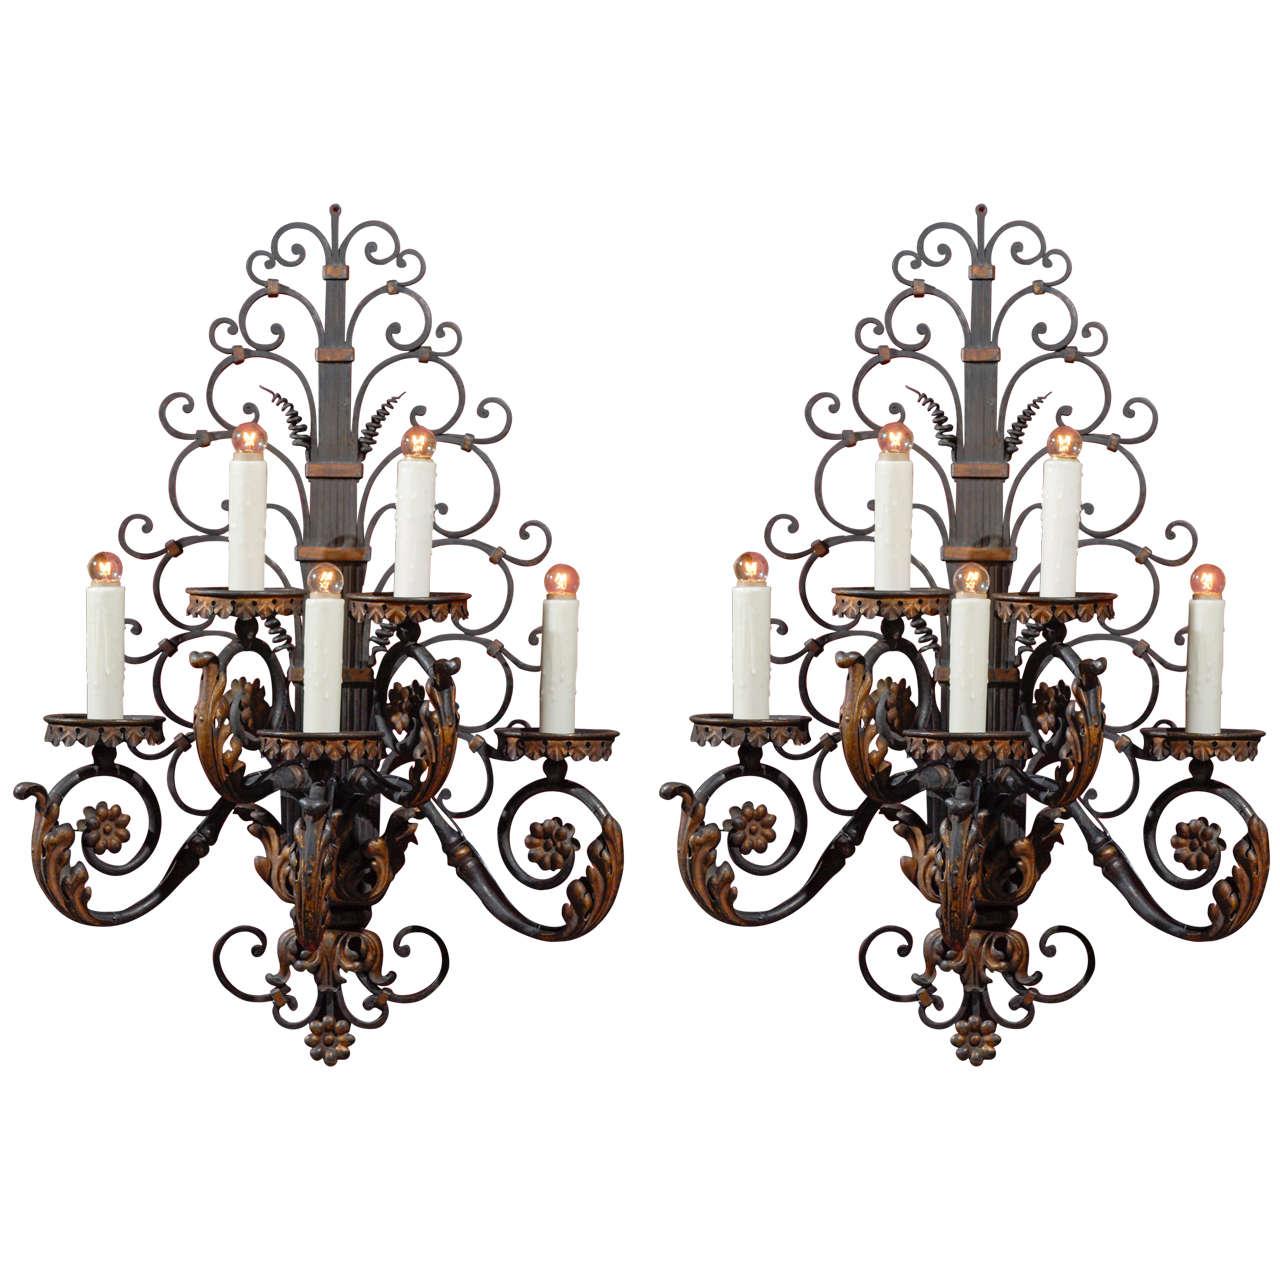 Pair of antique iron sconces For Sale